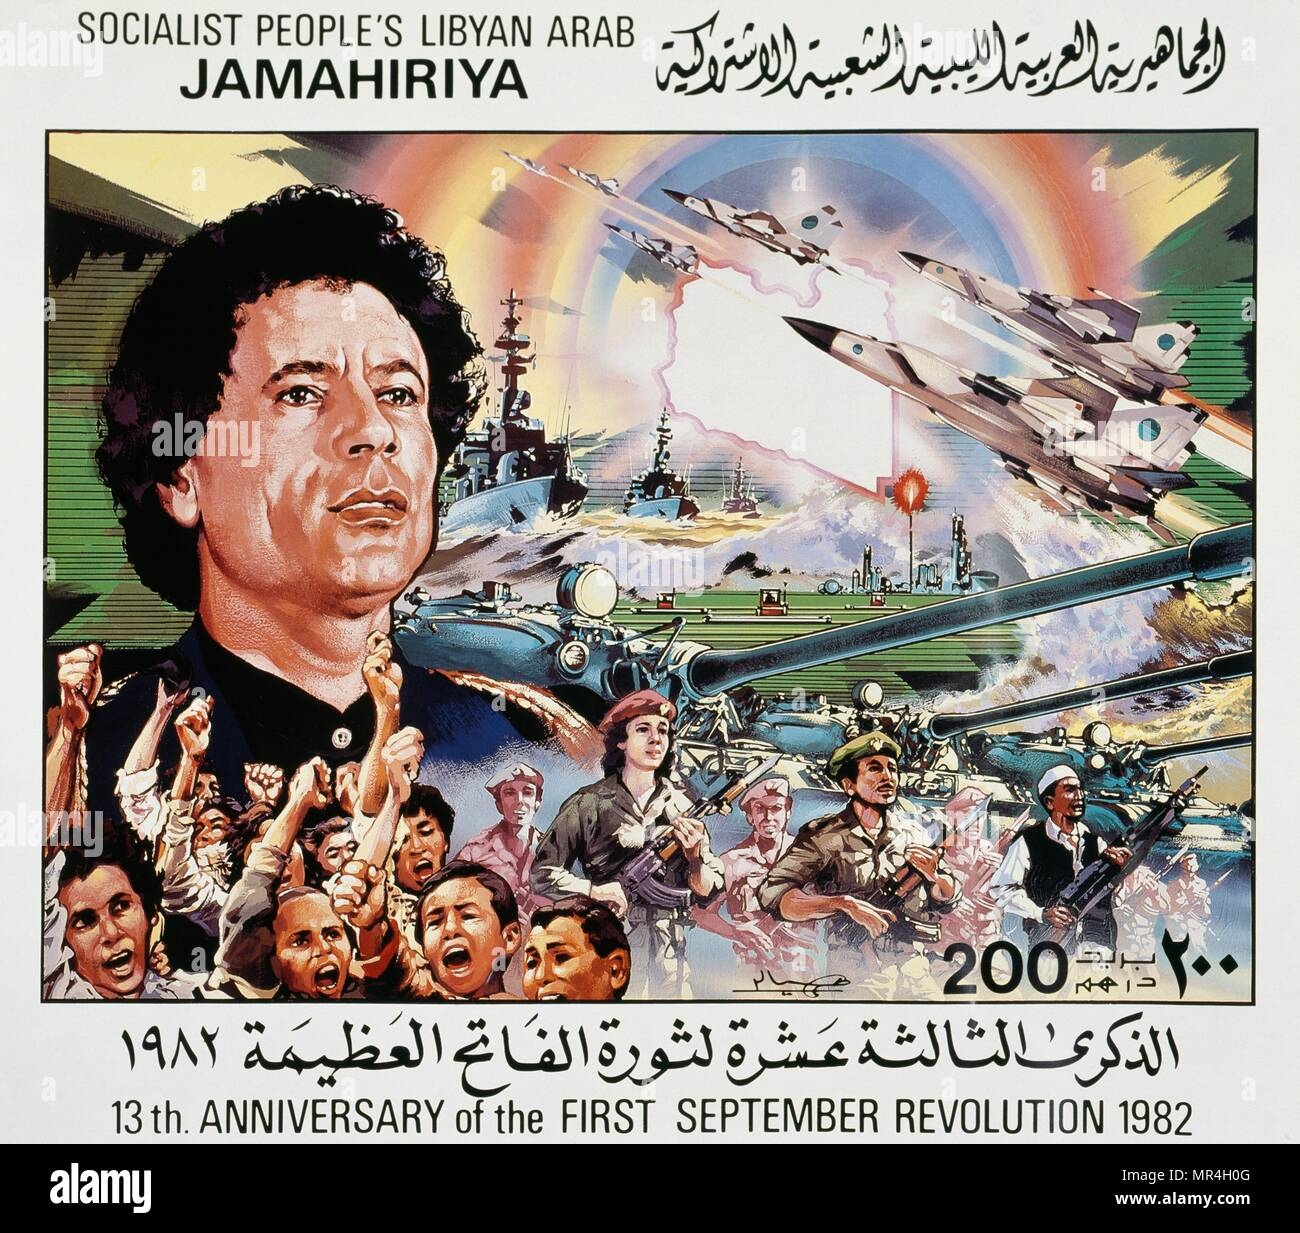 Libyan propaganda poster 1982, depicting the Libyan leader Muammar Mohammed Abu Minyar Gaddafi (c. 1942 - 2011),  a Libyan revolutionary, politician, and political theorist. - Stock Image